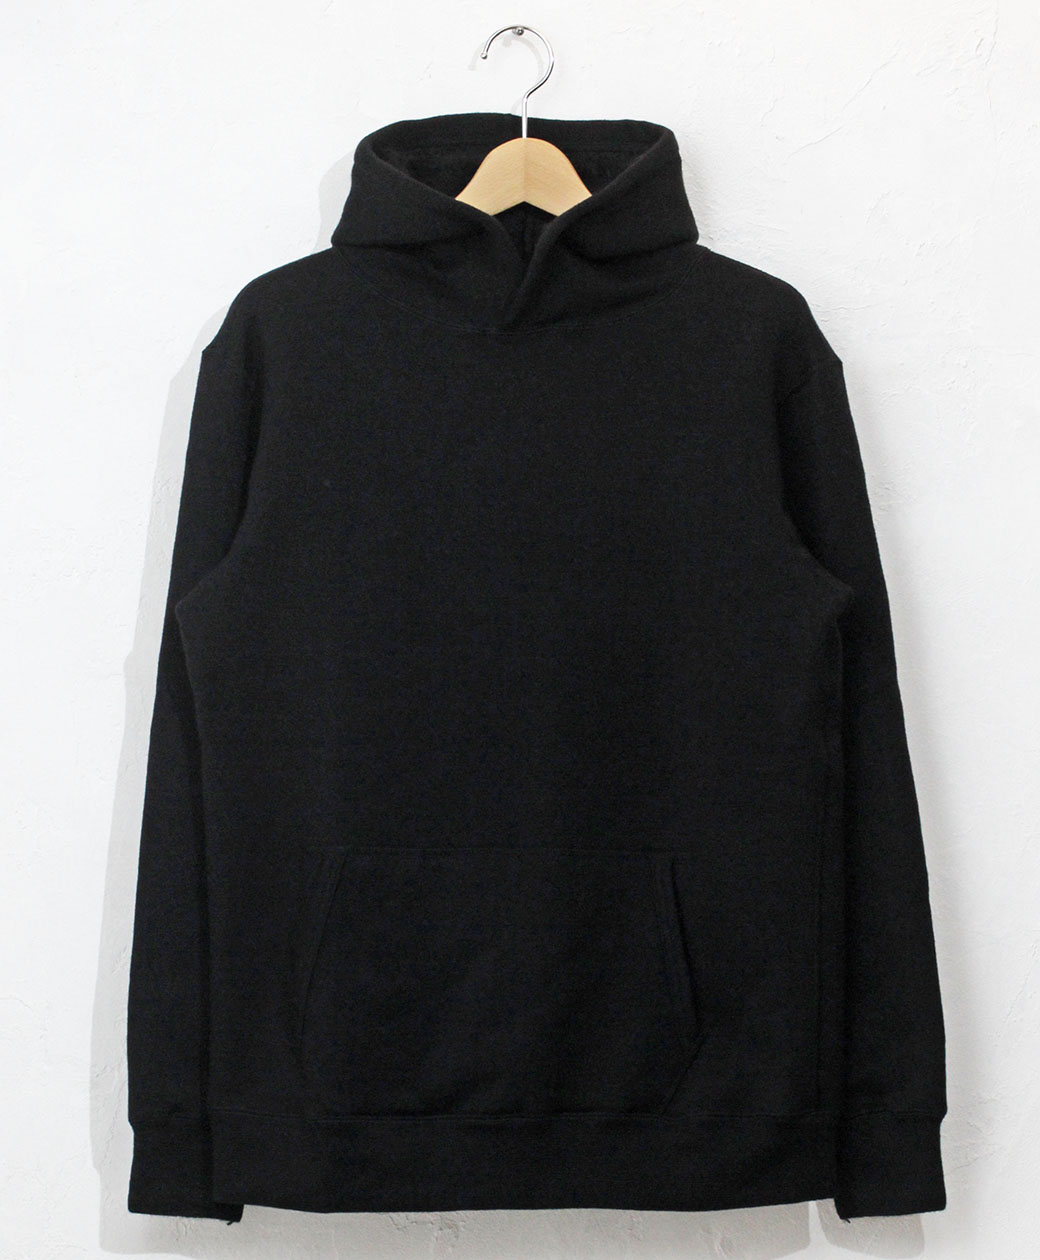 yetina pullover hoodie(black)